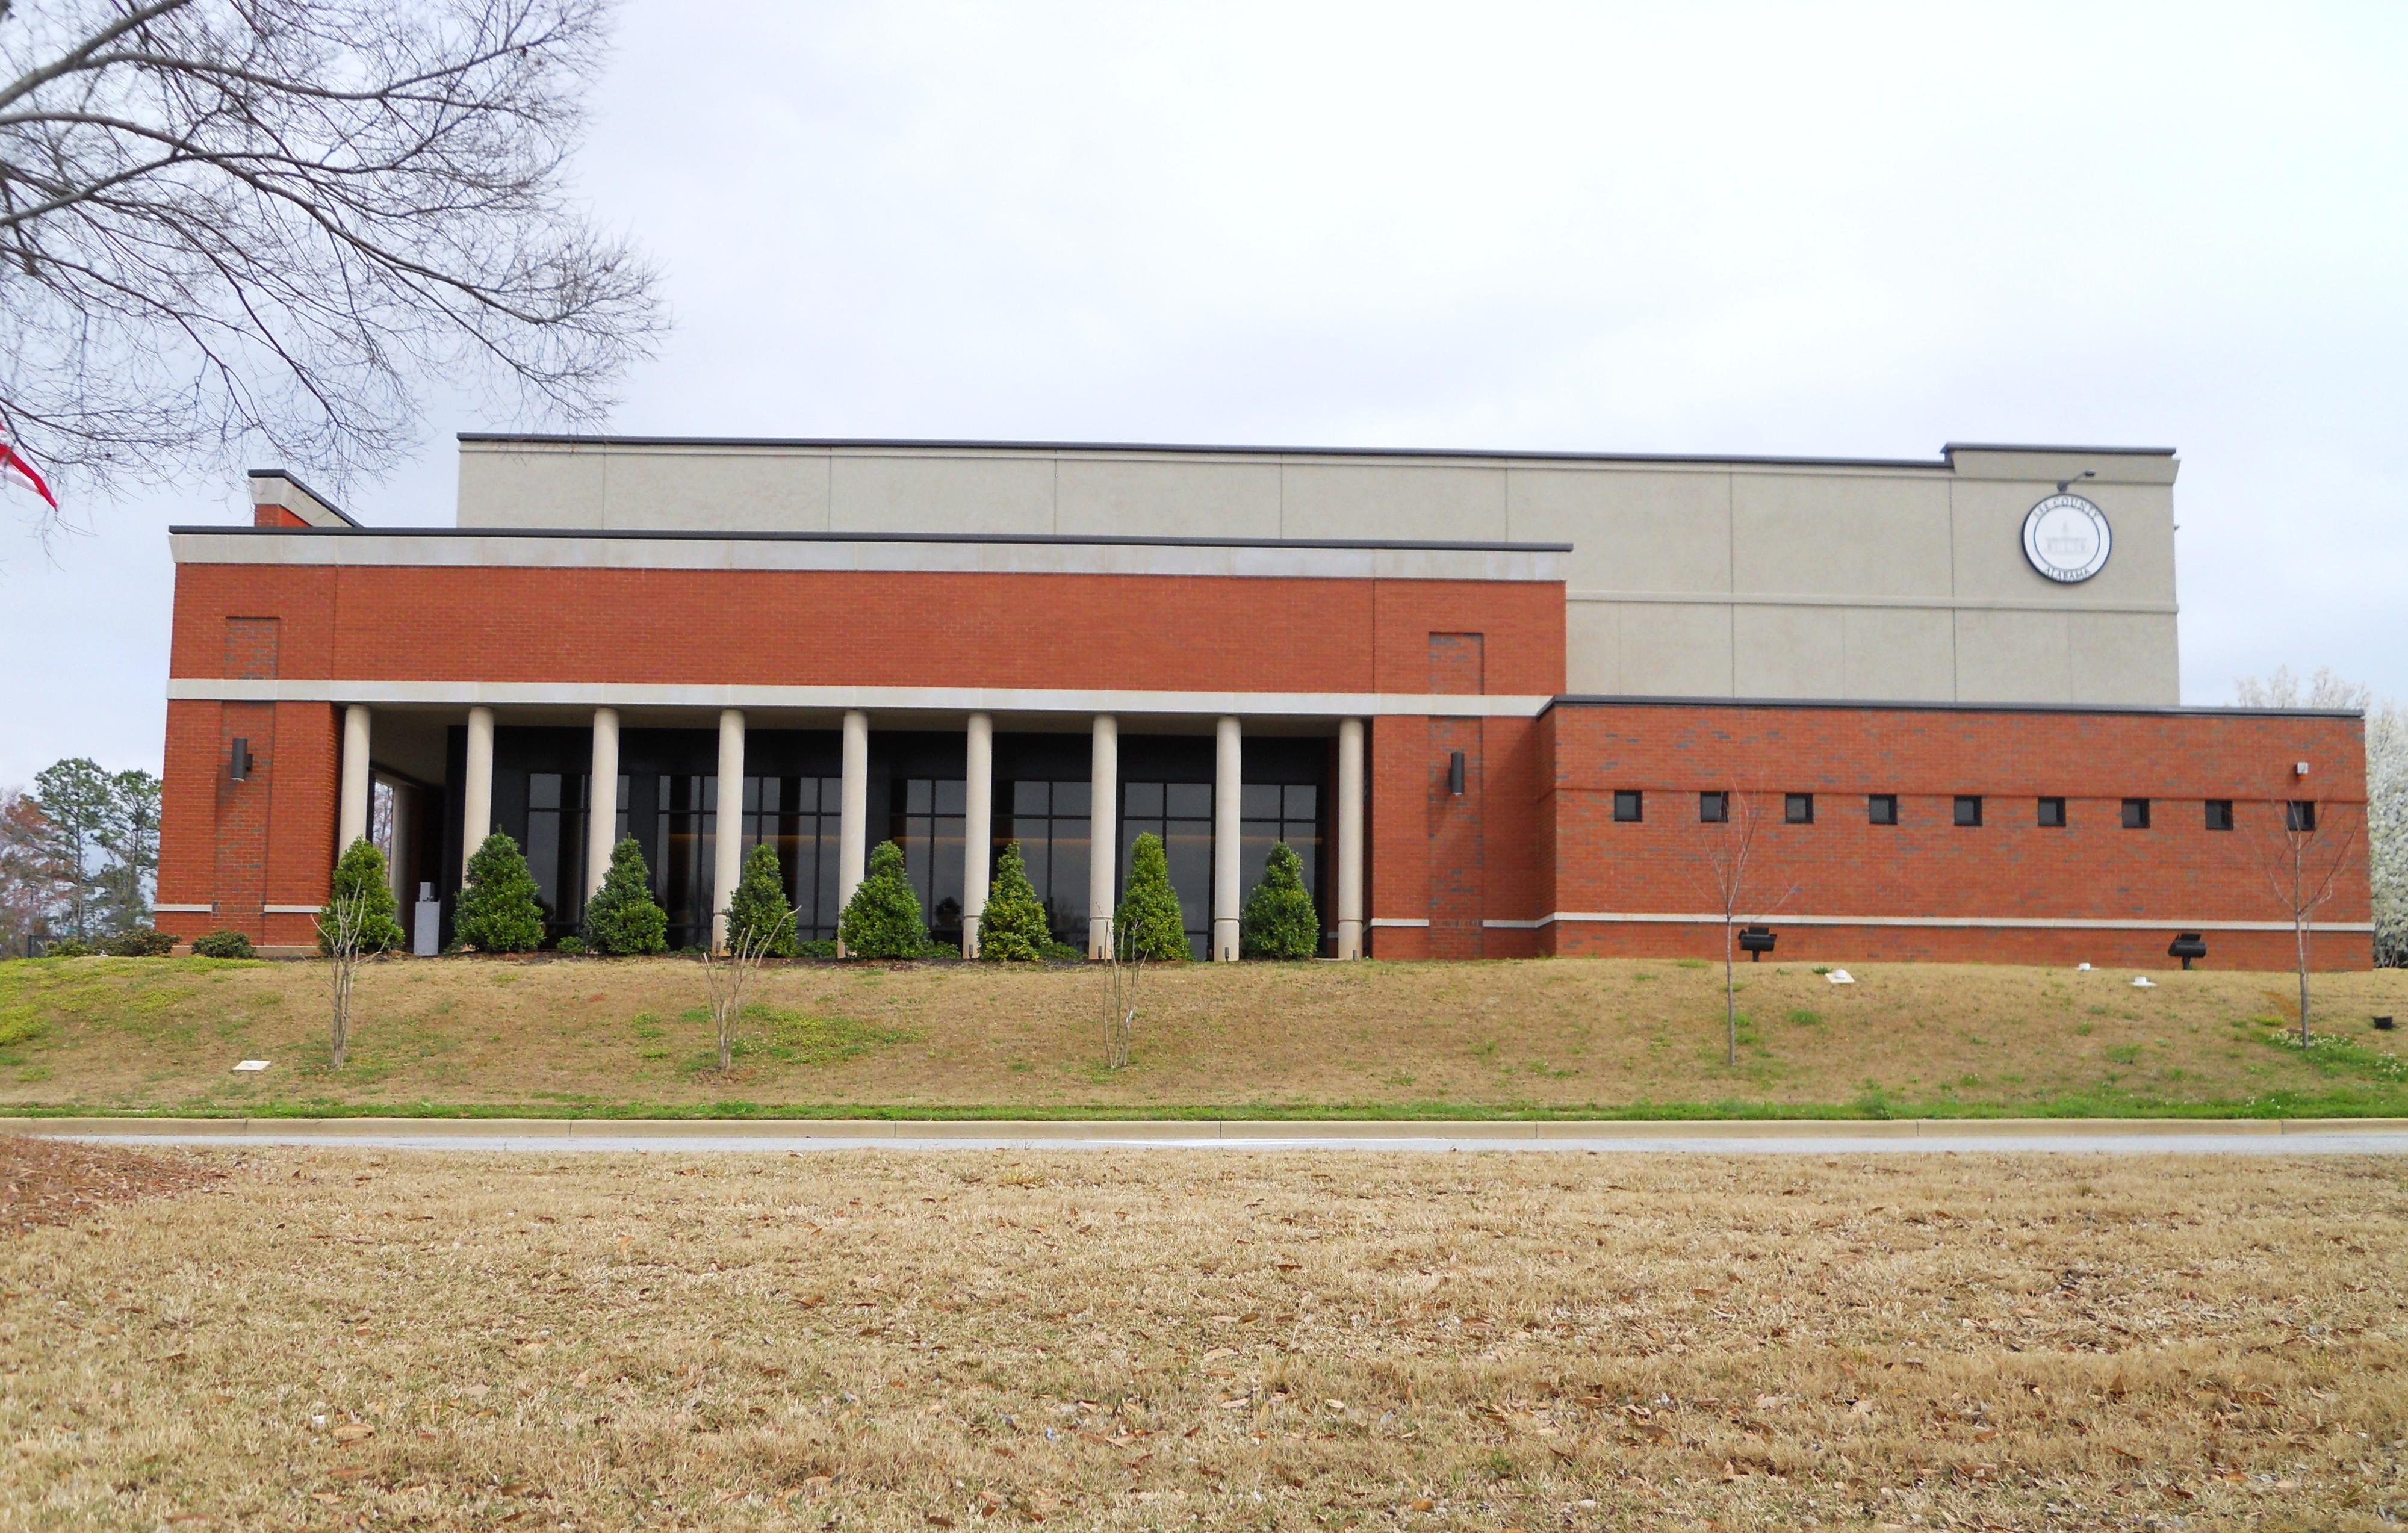 Alabama lee county salem - Alabama Lee County Salem 26